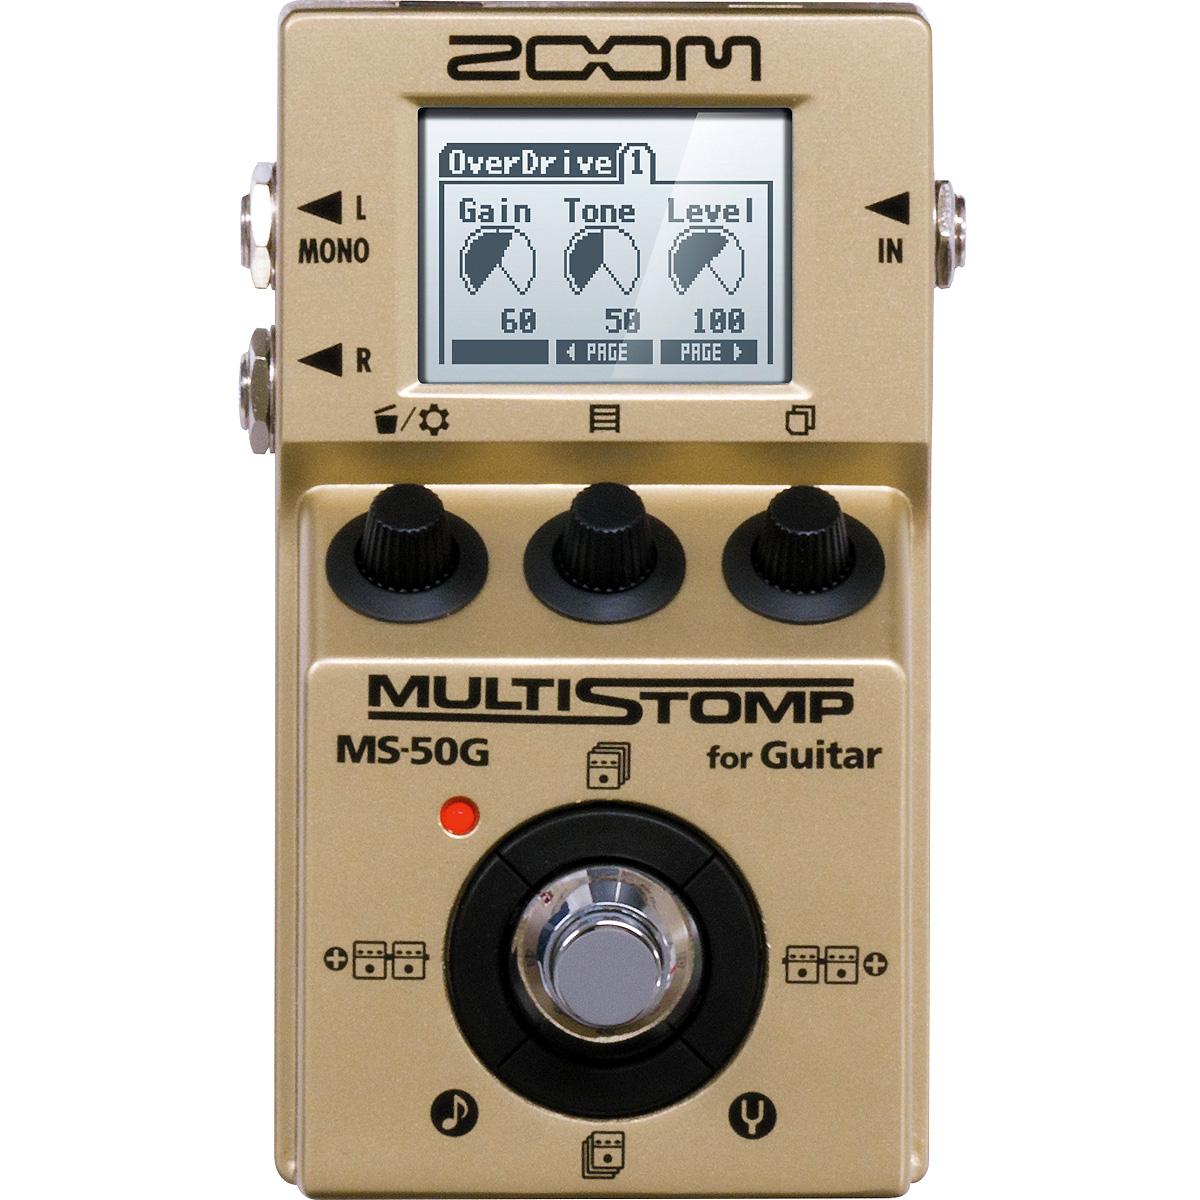 ZOOM / MS-50G-I MultiStomp Guitar Pedal Gold Limited 《予約注文/7月3日発売予定》【限定生産モデル】